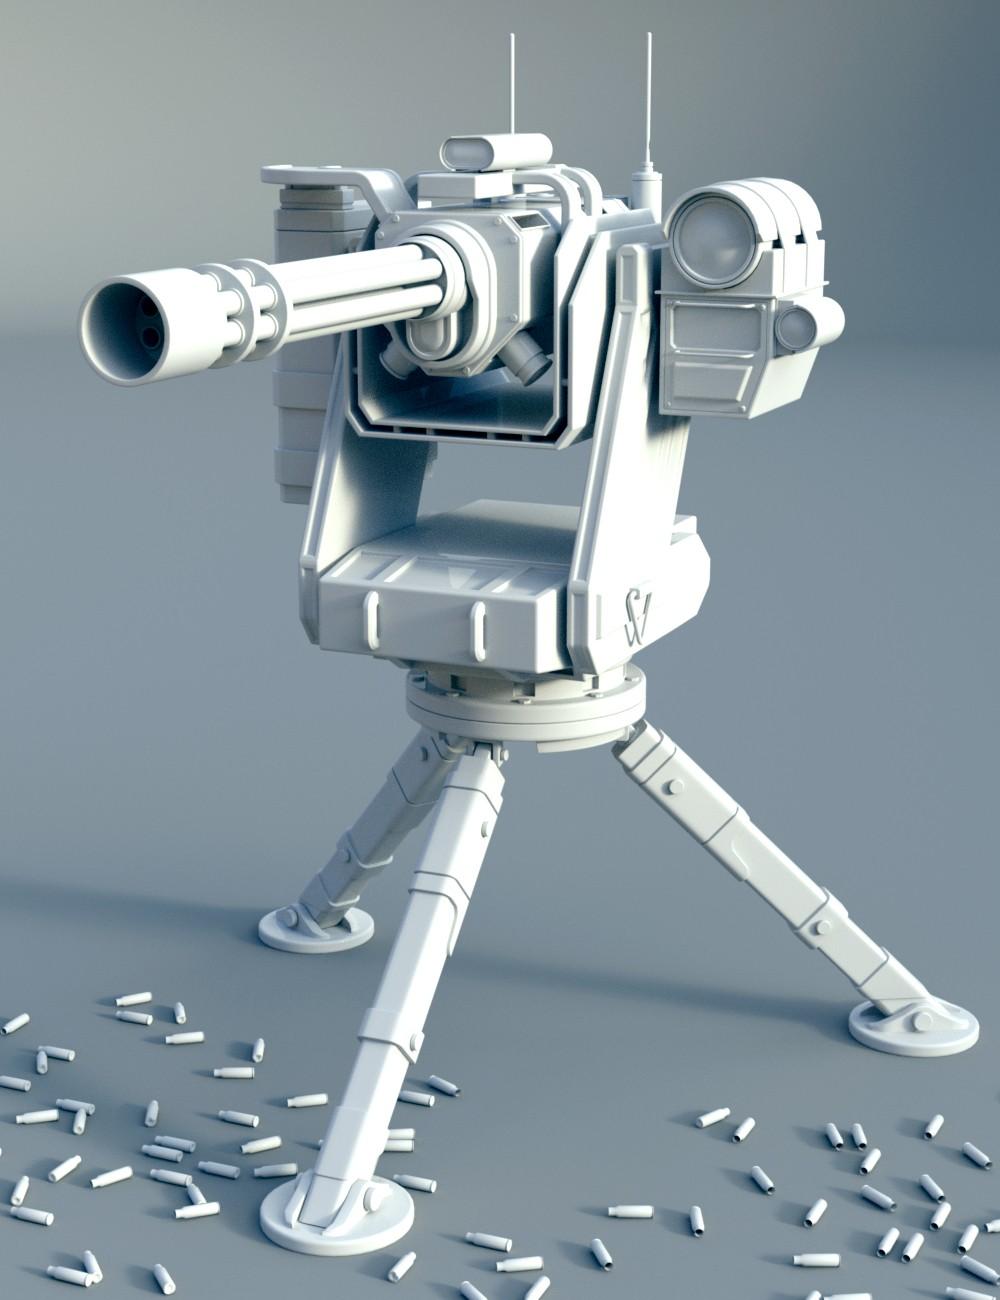 Download DAZ Studio 3 for FREE!: DAZ 3D - Sentry Gun